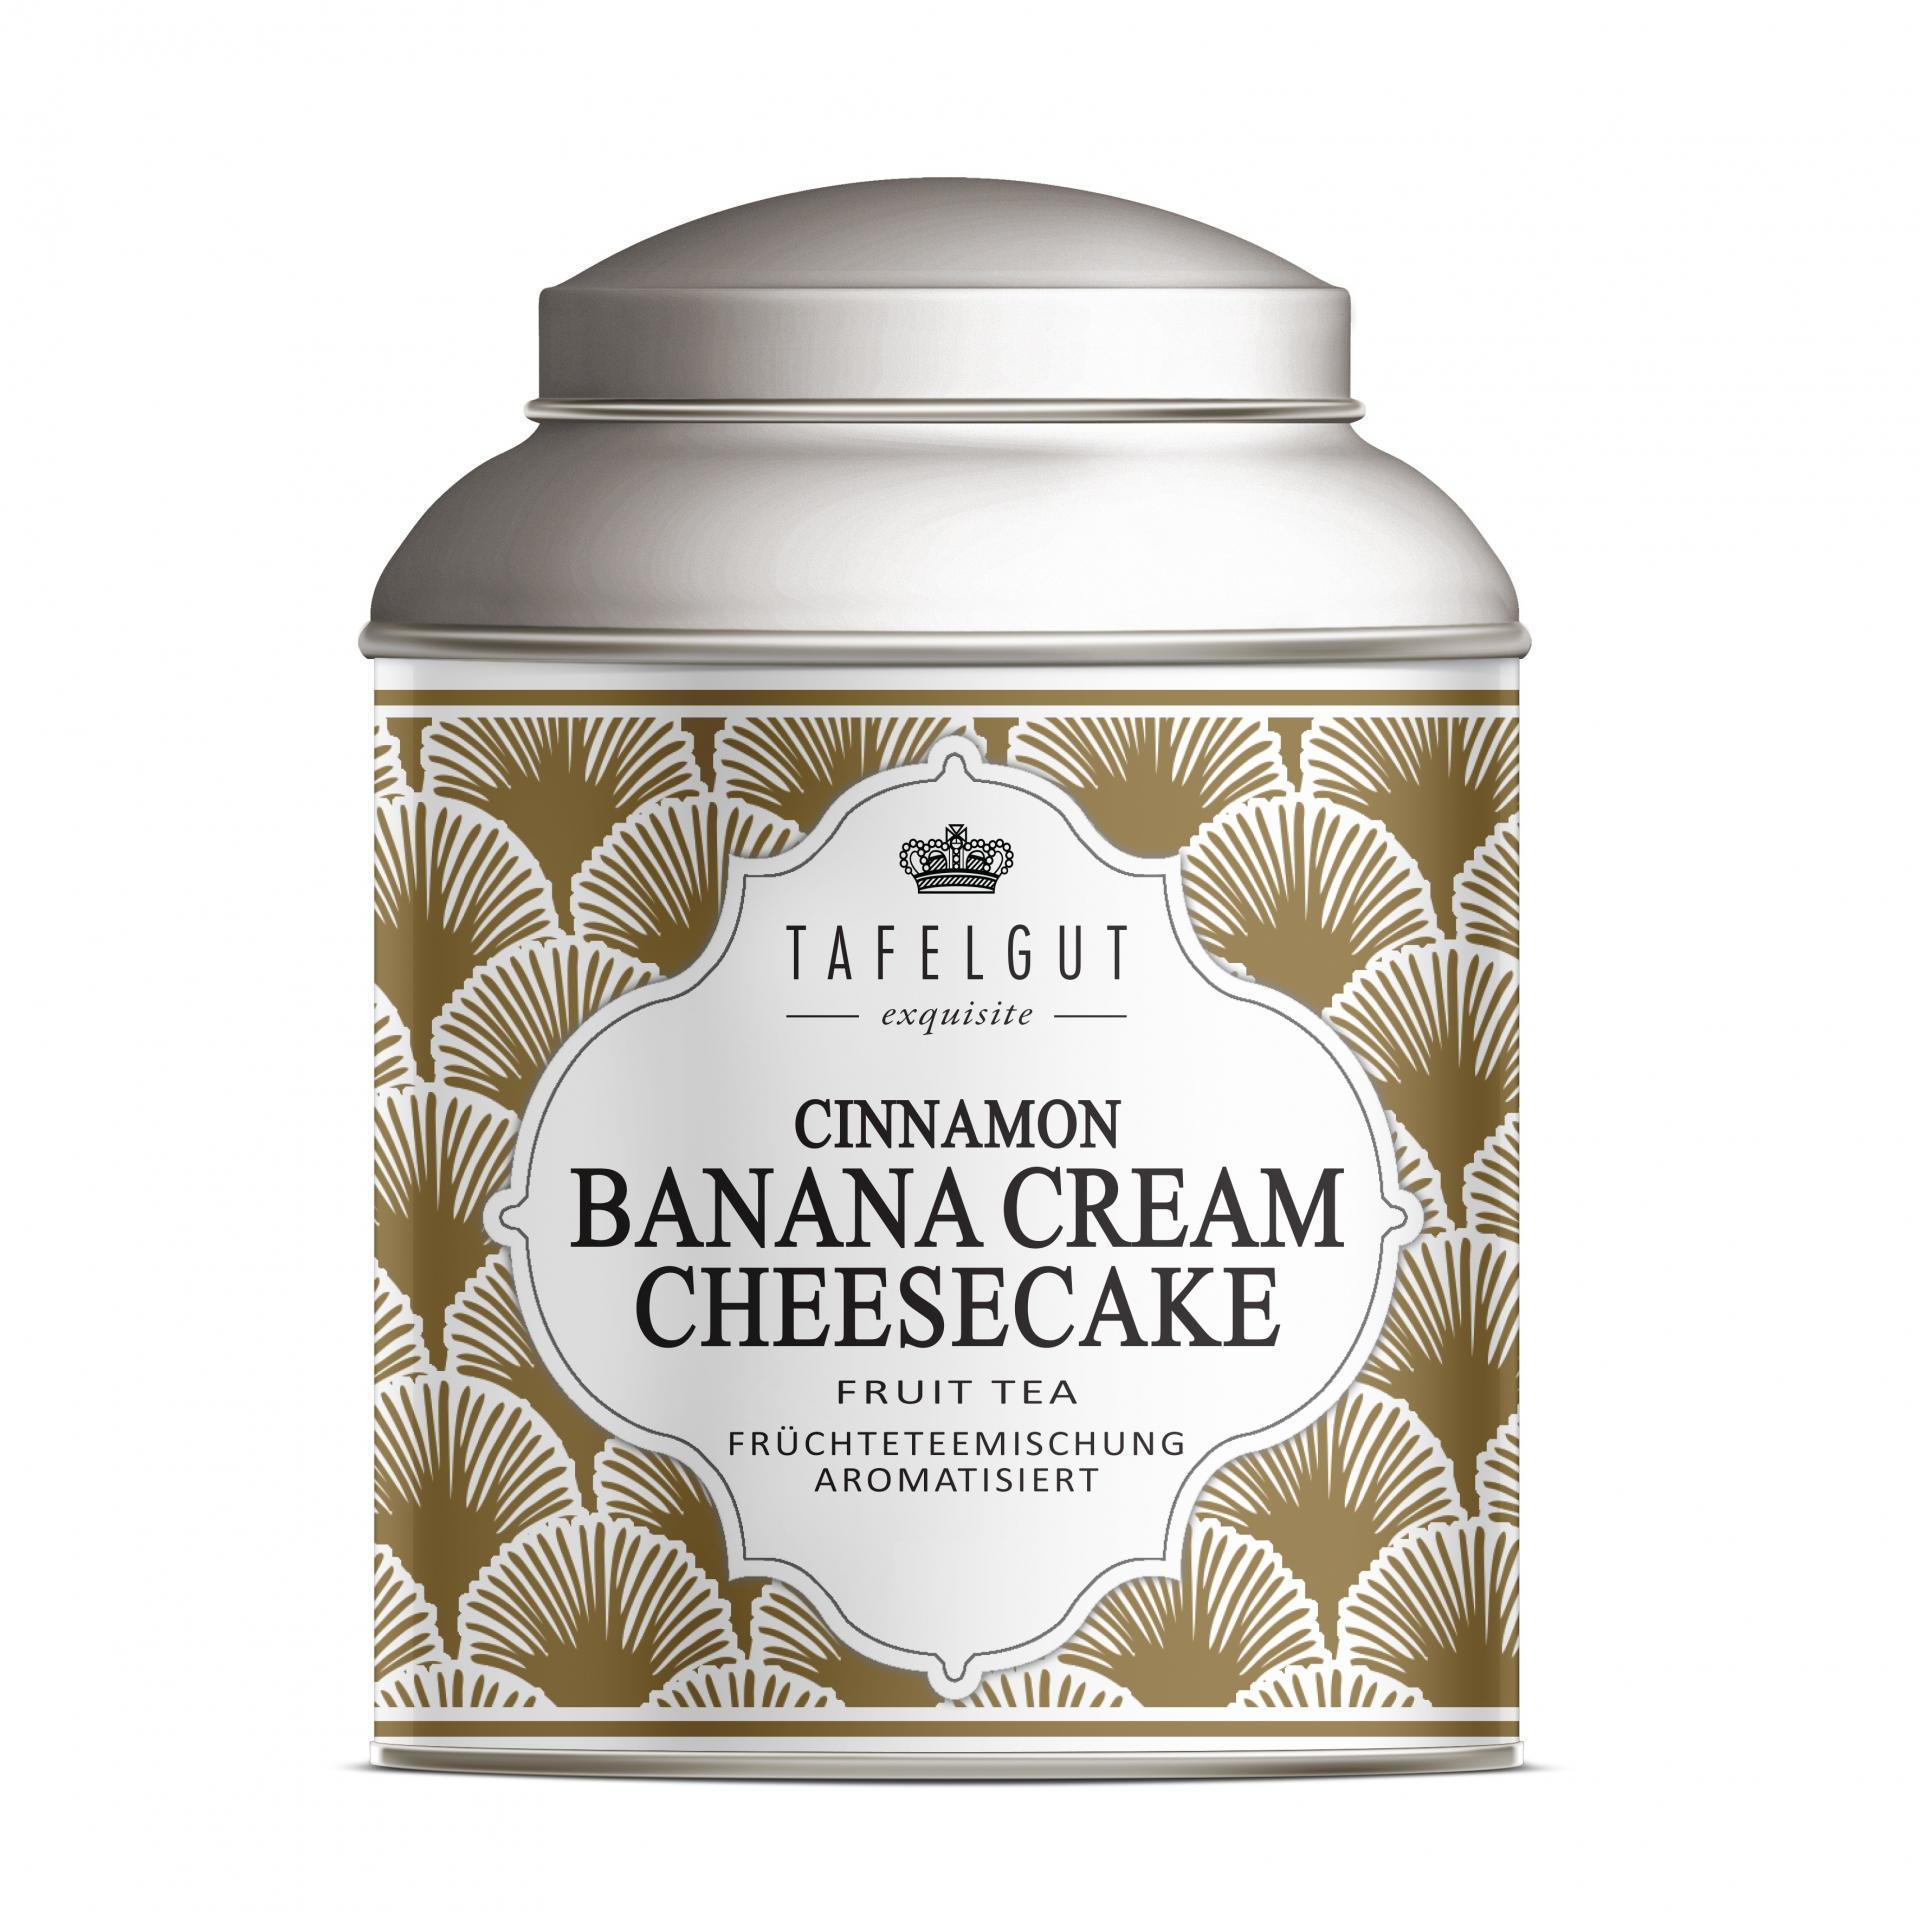 TAFELGUT Mini čaj Cinnamon Banana Cream Cheesecake - 40gr, měděná barva, kov